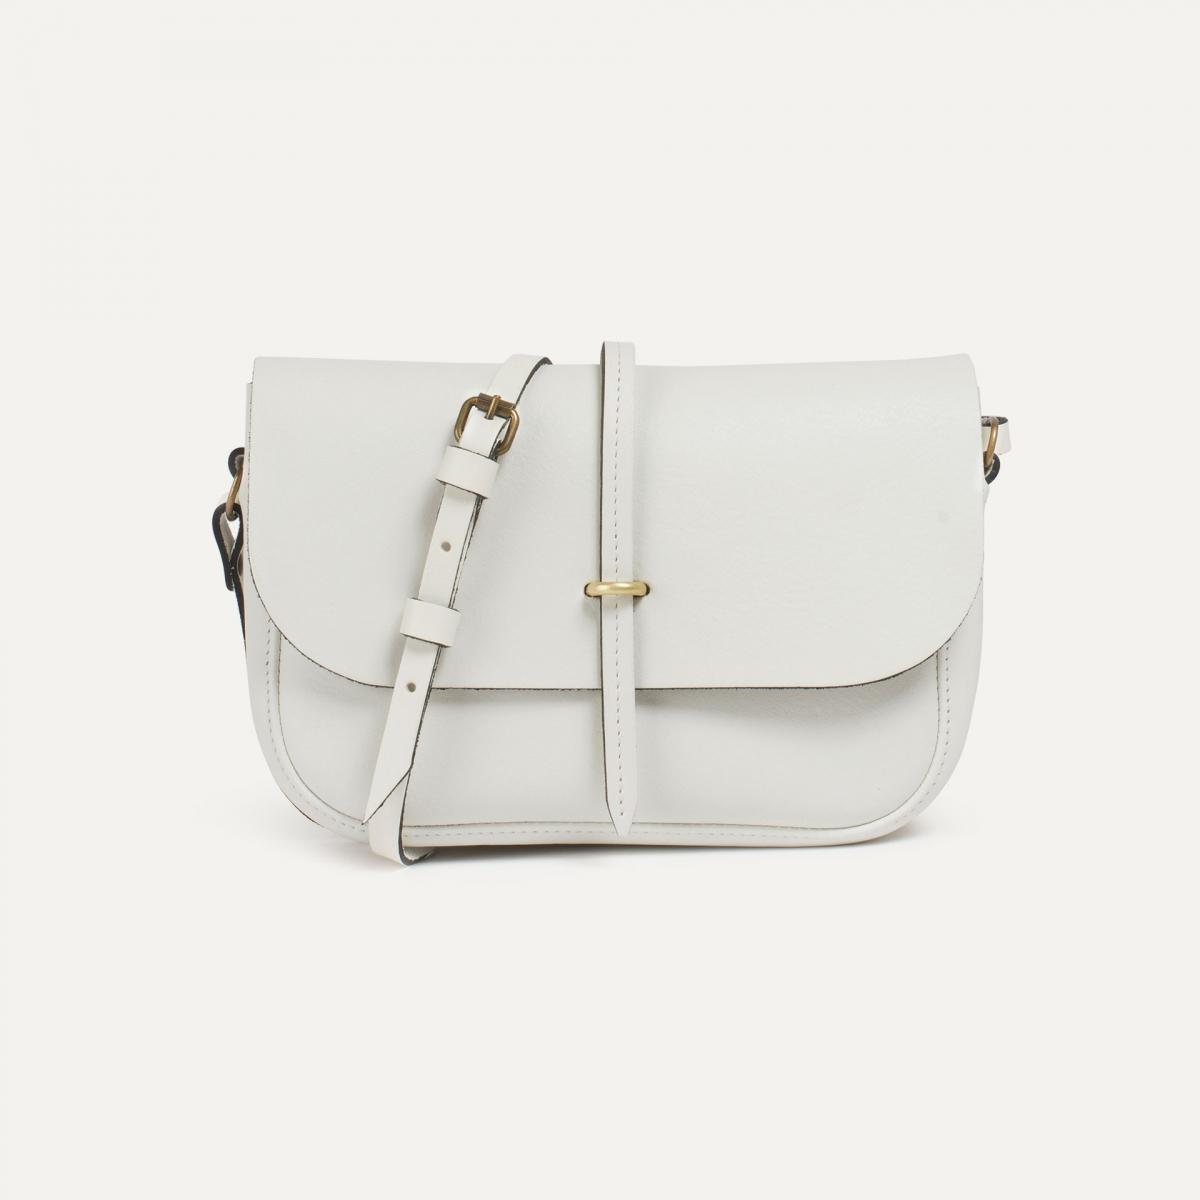 Pastis handbag - White (image n°1)